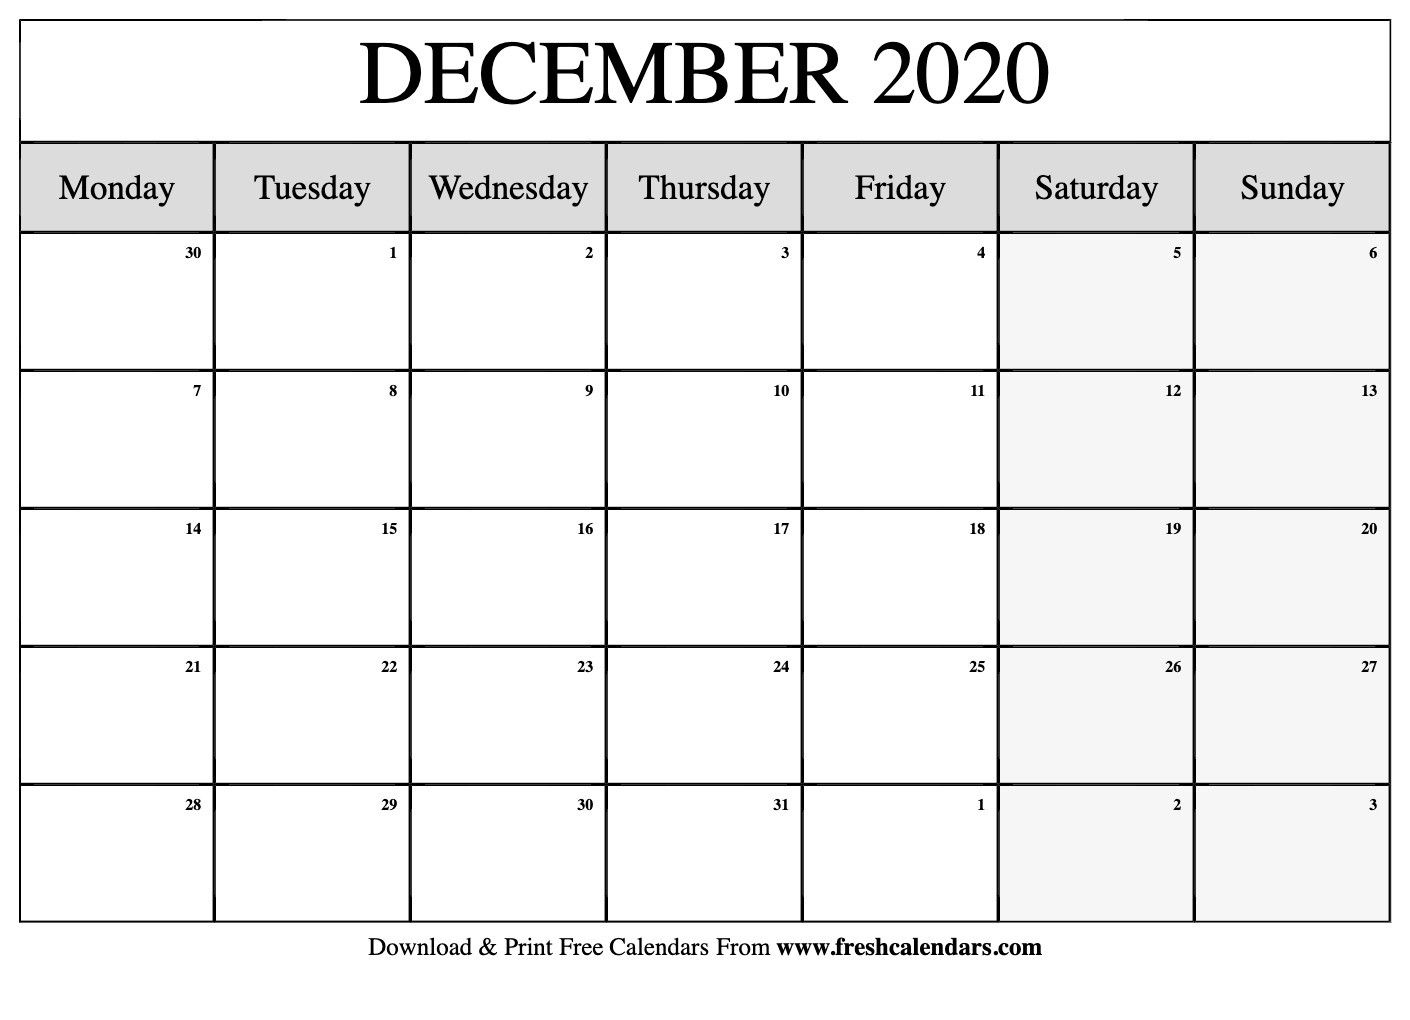 Free Printable December 2020 Calendar-Blank Monthly Calendar Starting On Monday